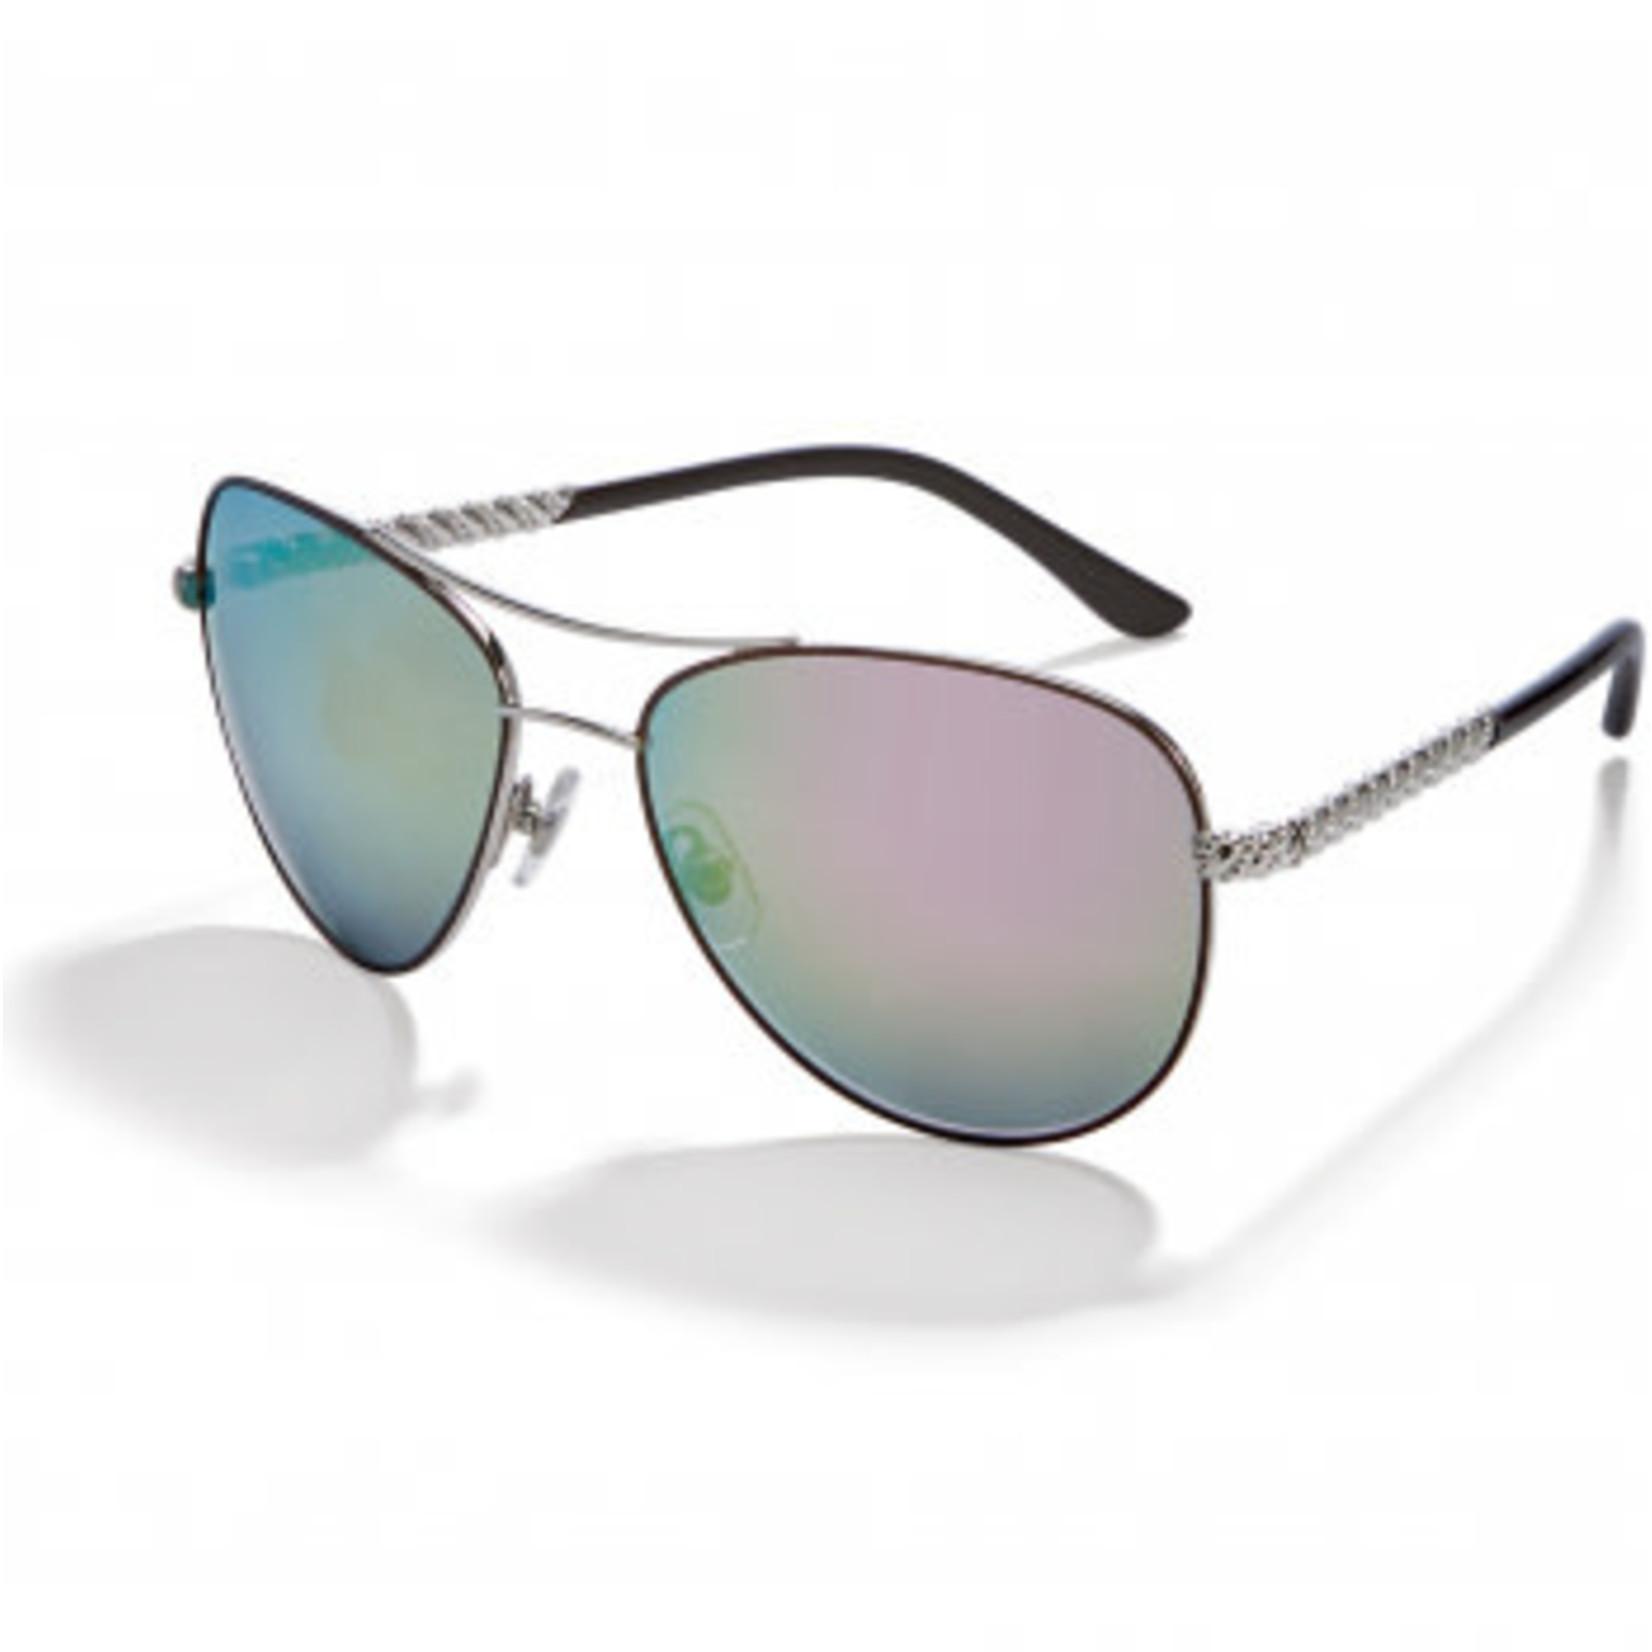 Brighton Helix Grn/PinkTinted Sunglasses